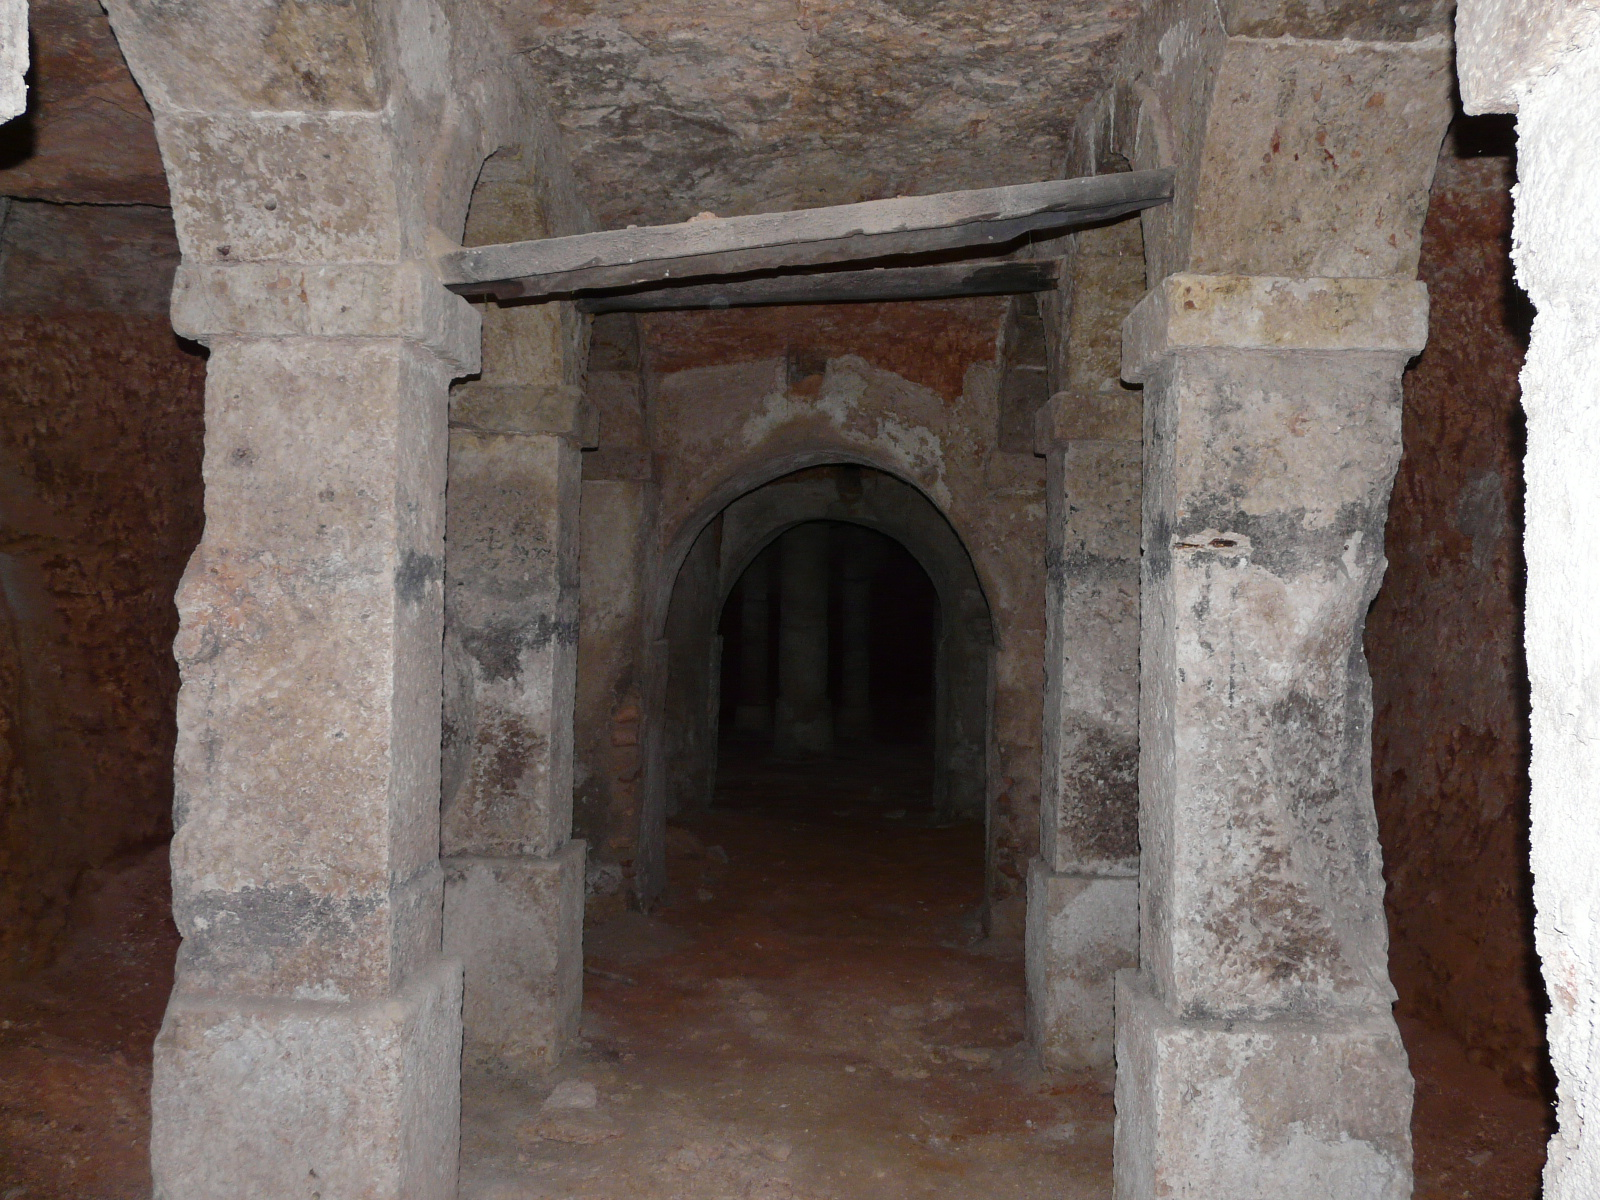 VDS 021112 Cueva Yedra 05